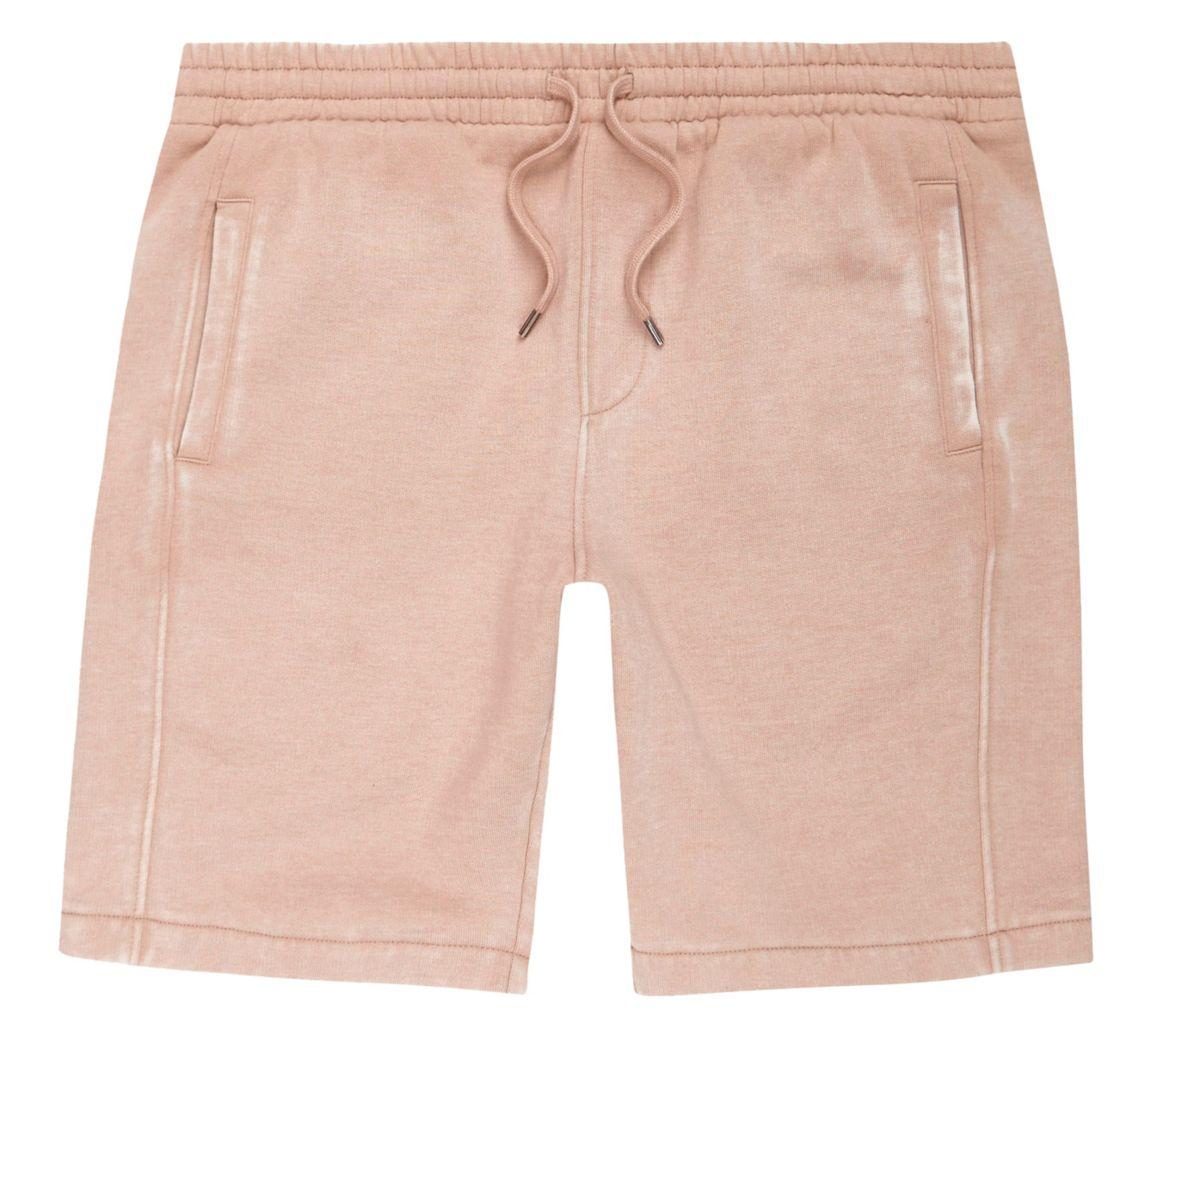 Pink burnout jersey shorts